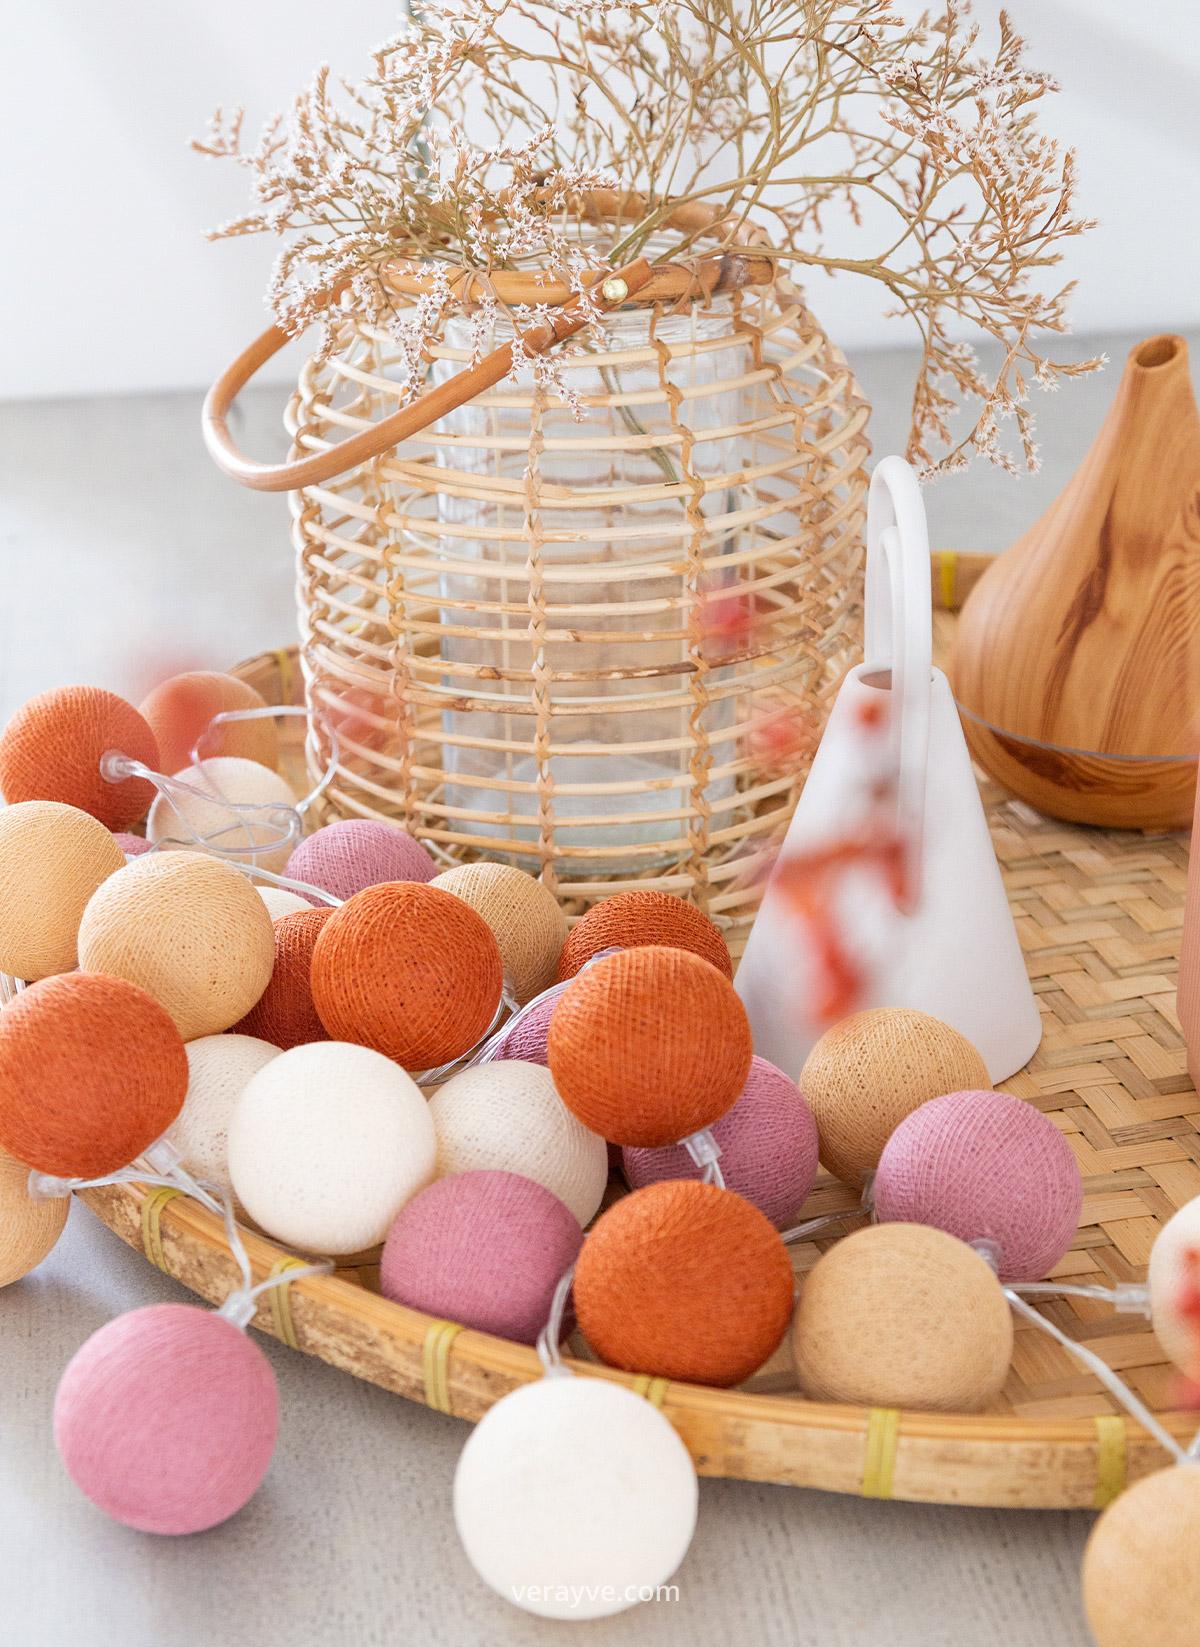 Product Fotoshoot Voorjaars Collectie Cotton Ball Ligths